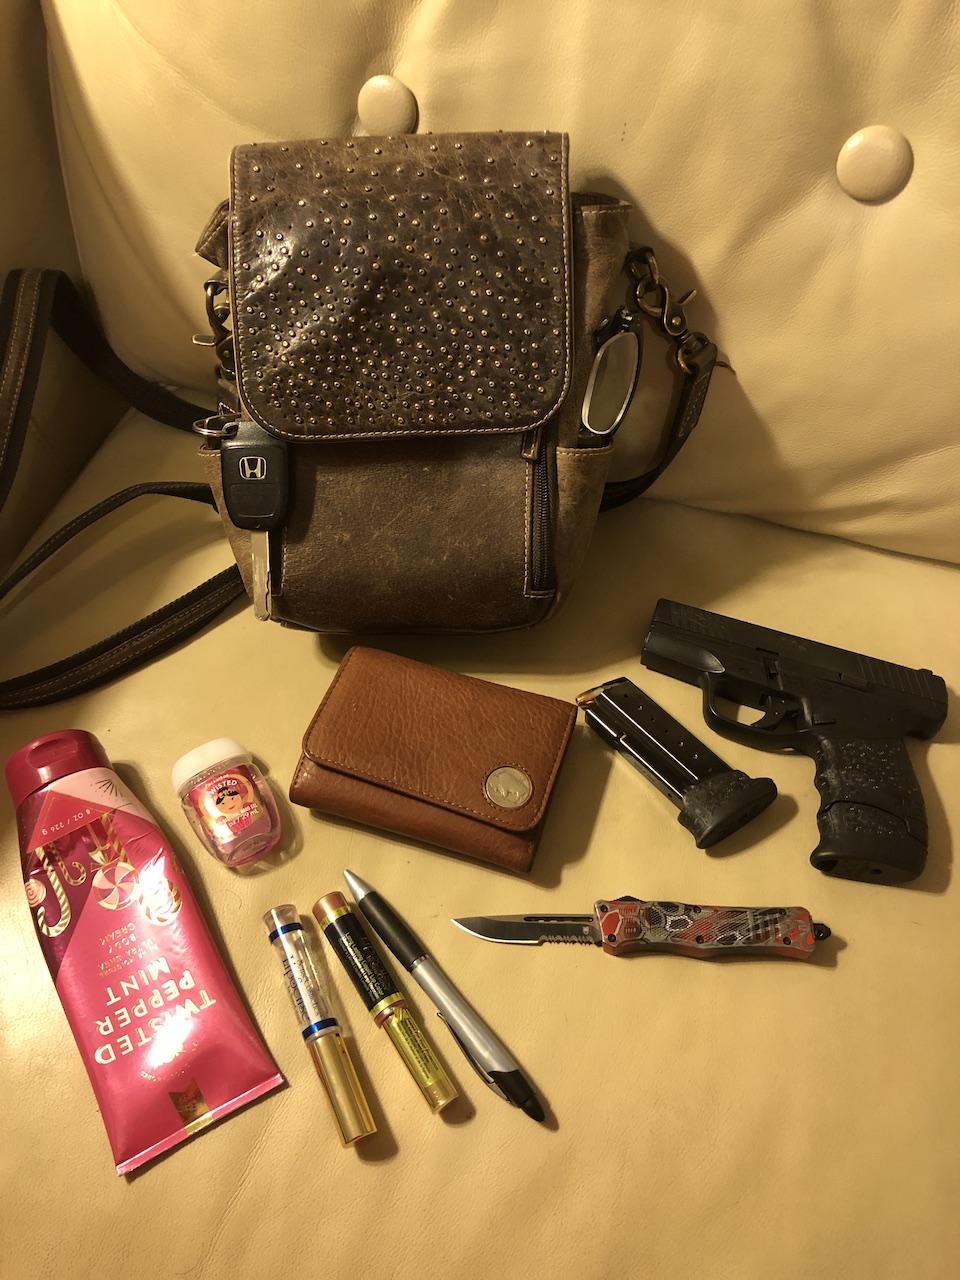 RhondA GTM ORiginal purse dump